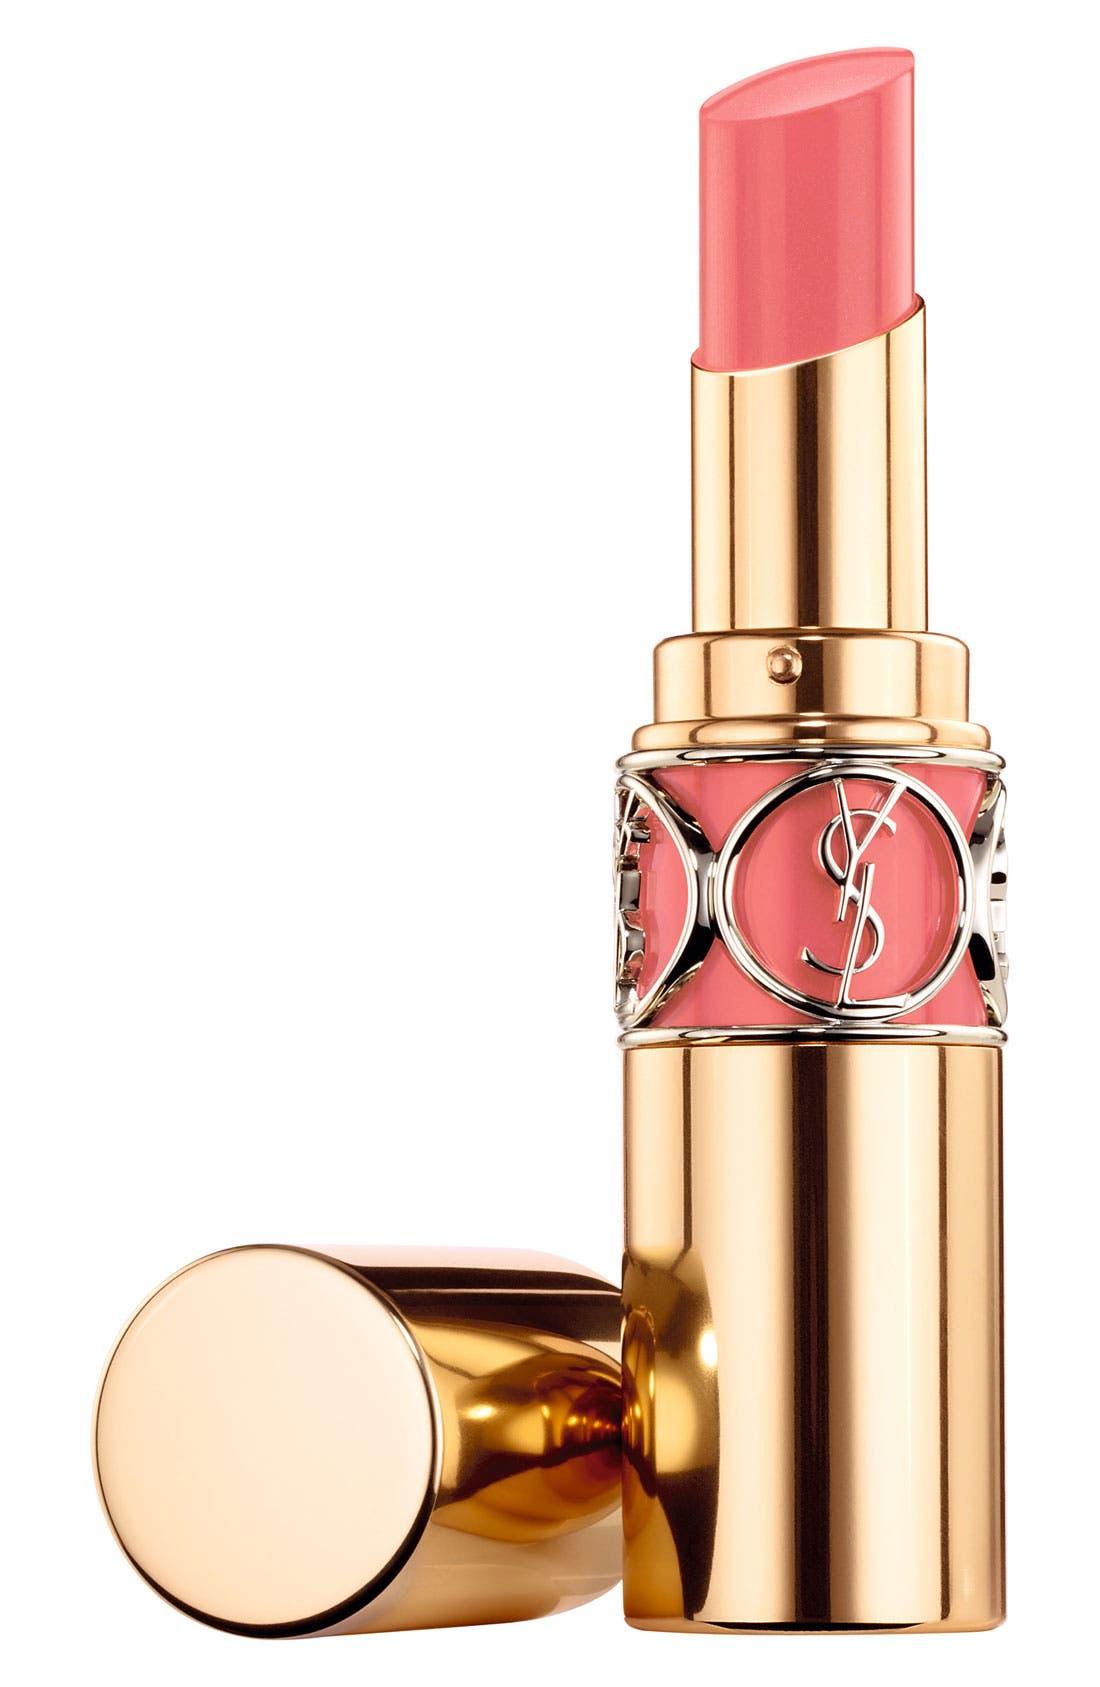 Yves Saint Laurent Rouge Volupte Shine Oil-In-Stick Lipstick - 13 Pink In Paris